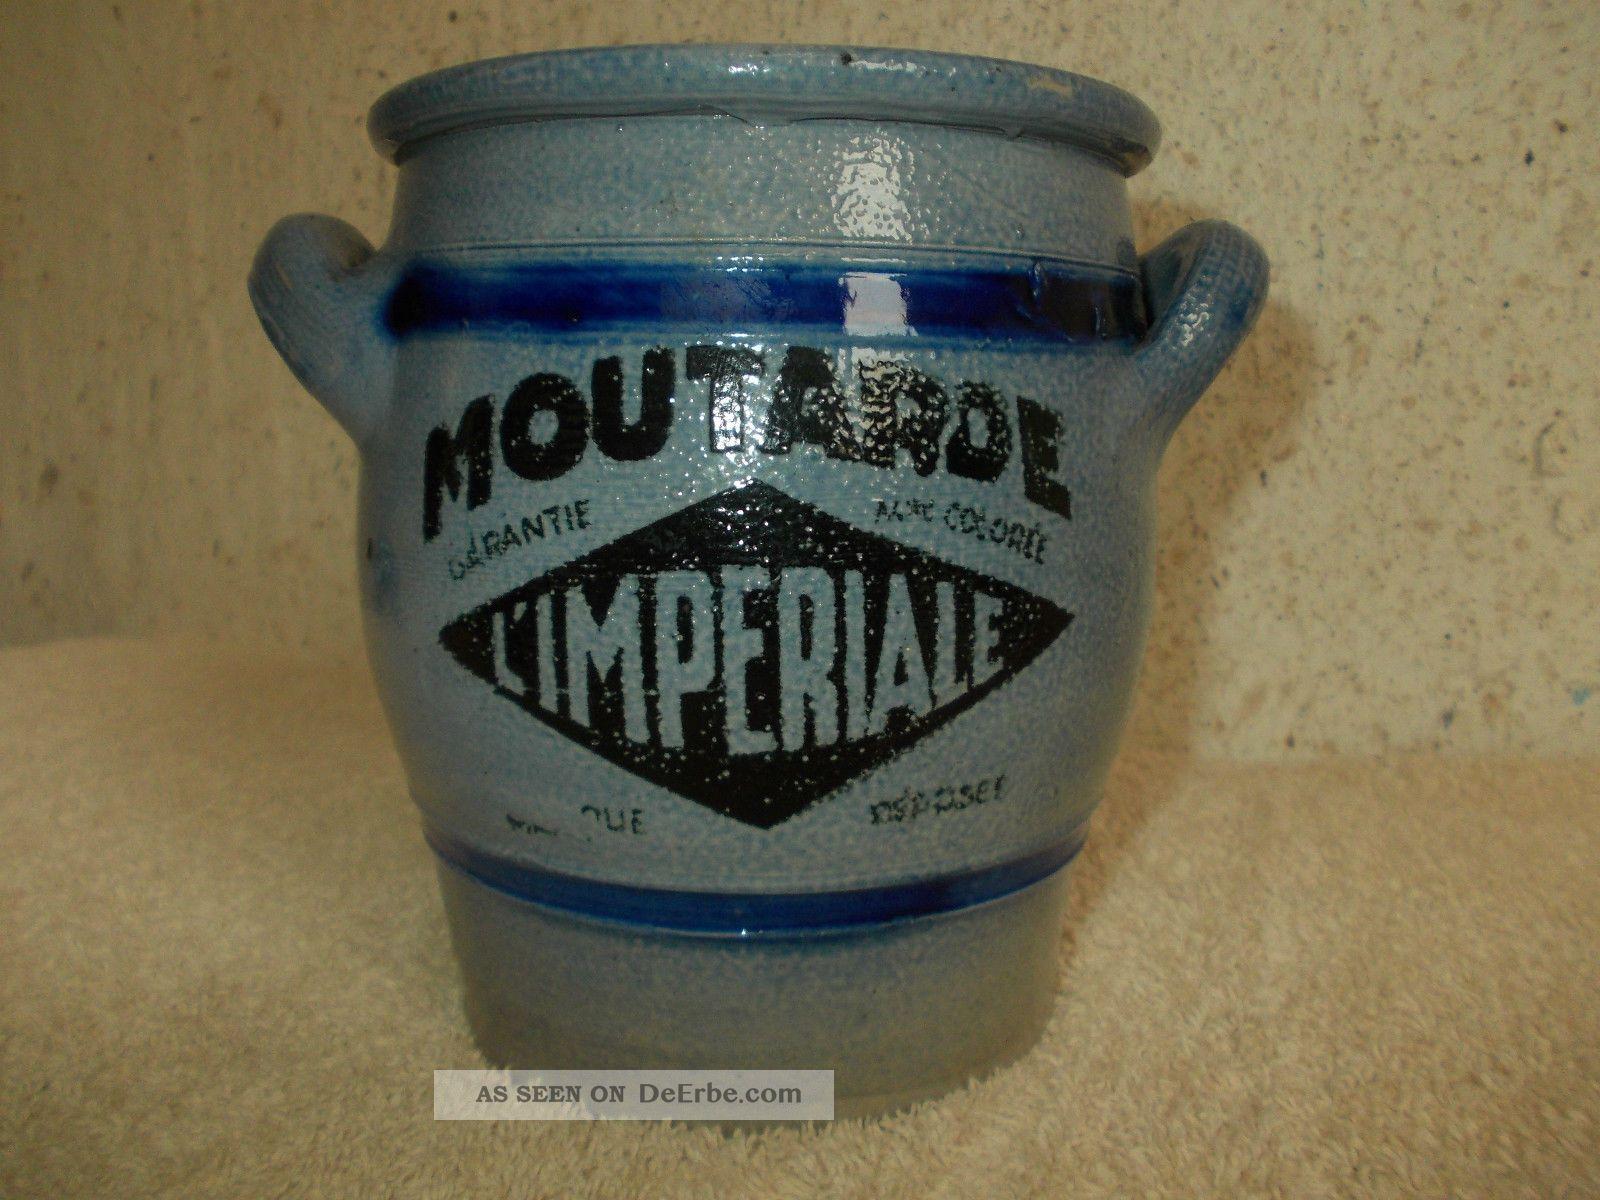 Seltener 1 Liter Moutarde Topf,  Senftopf,  Tontopf,  Französischer Senftopf,  Moutarde Kaufleute & Krämer Bild